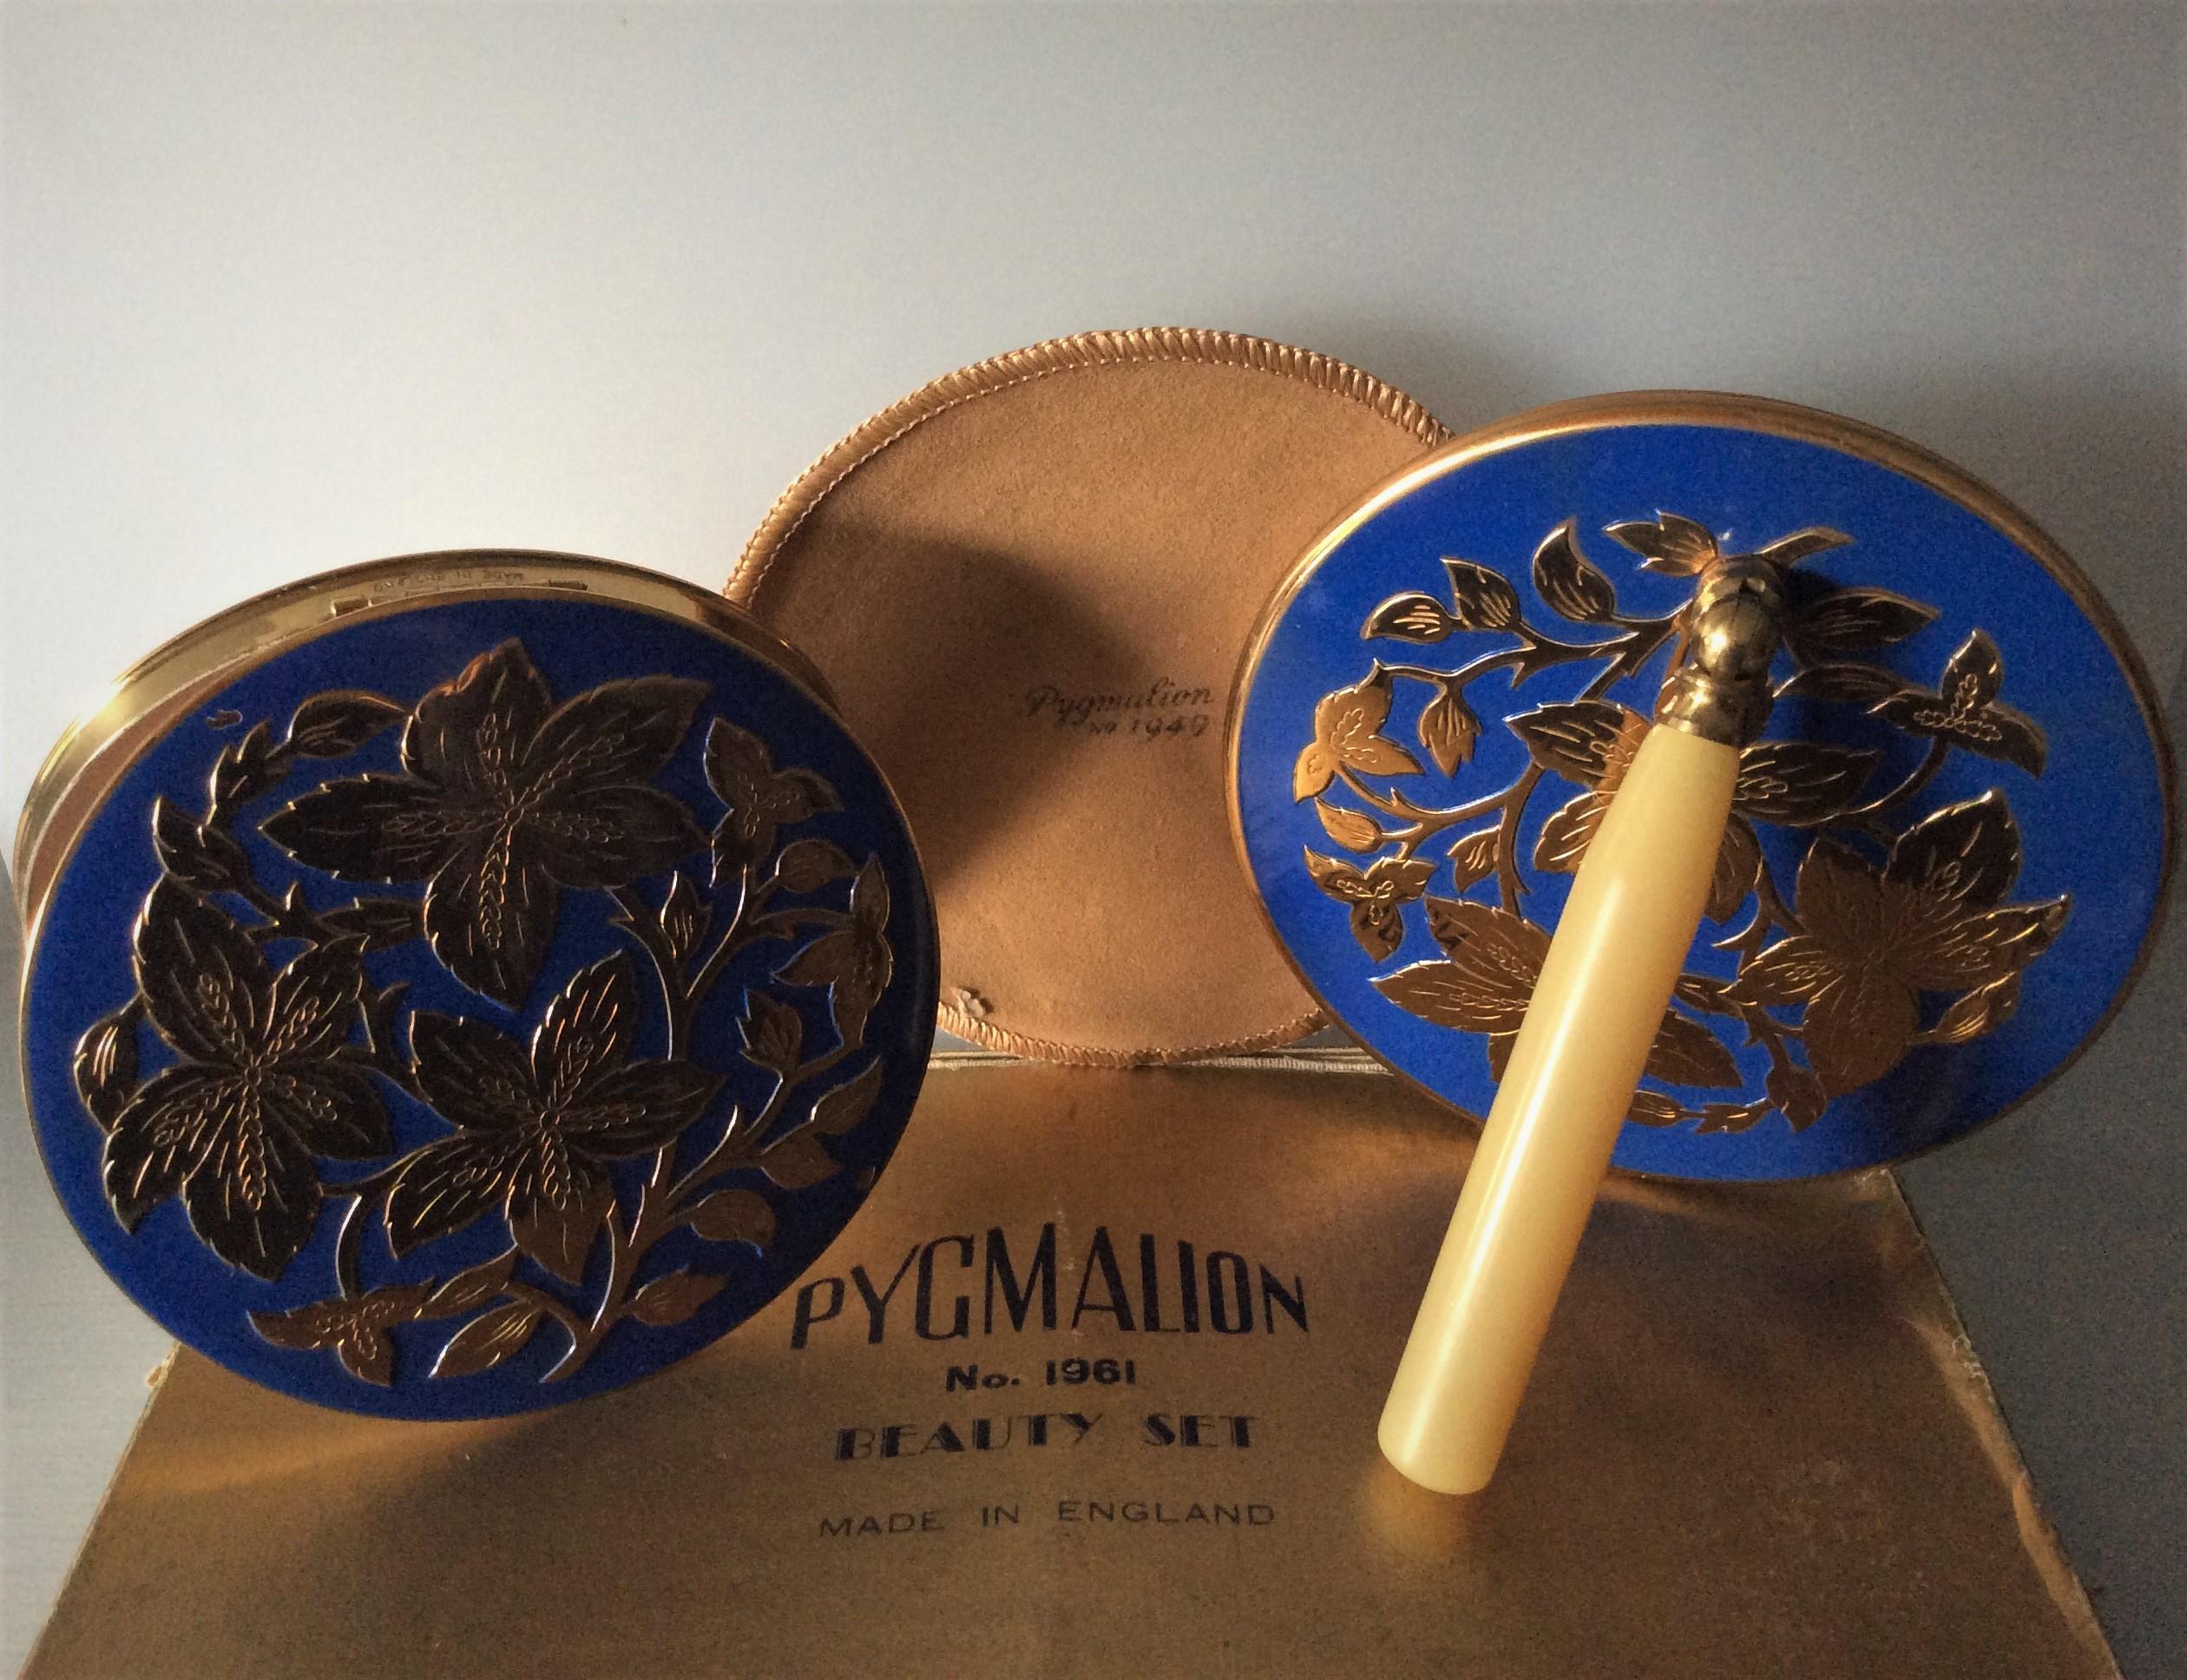 Very Rare Vintage PYGMALION Gold Tone and Enamel Vanity Beauty Set including Original Box